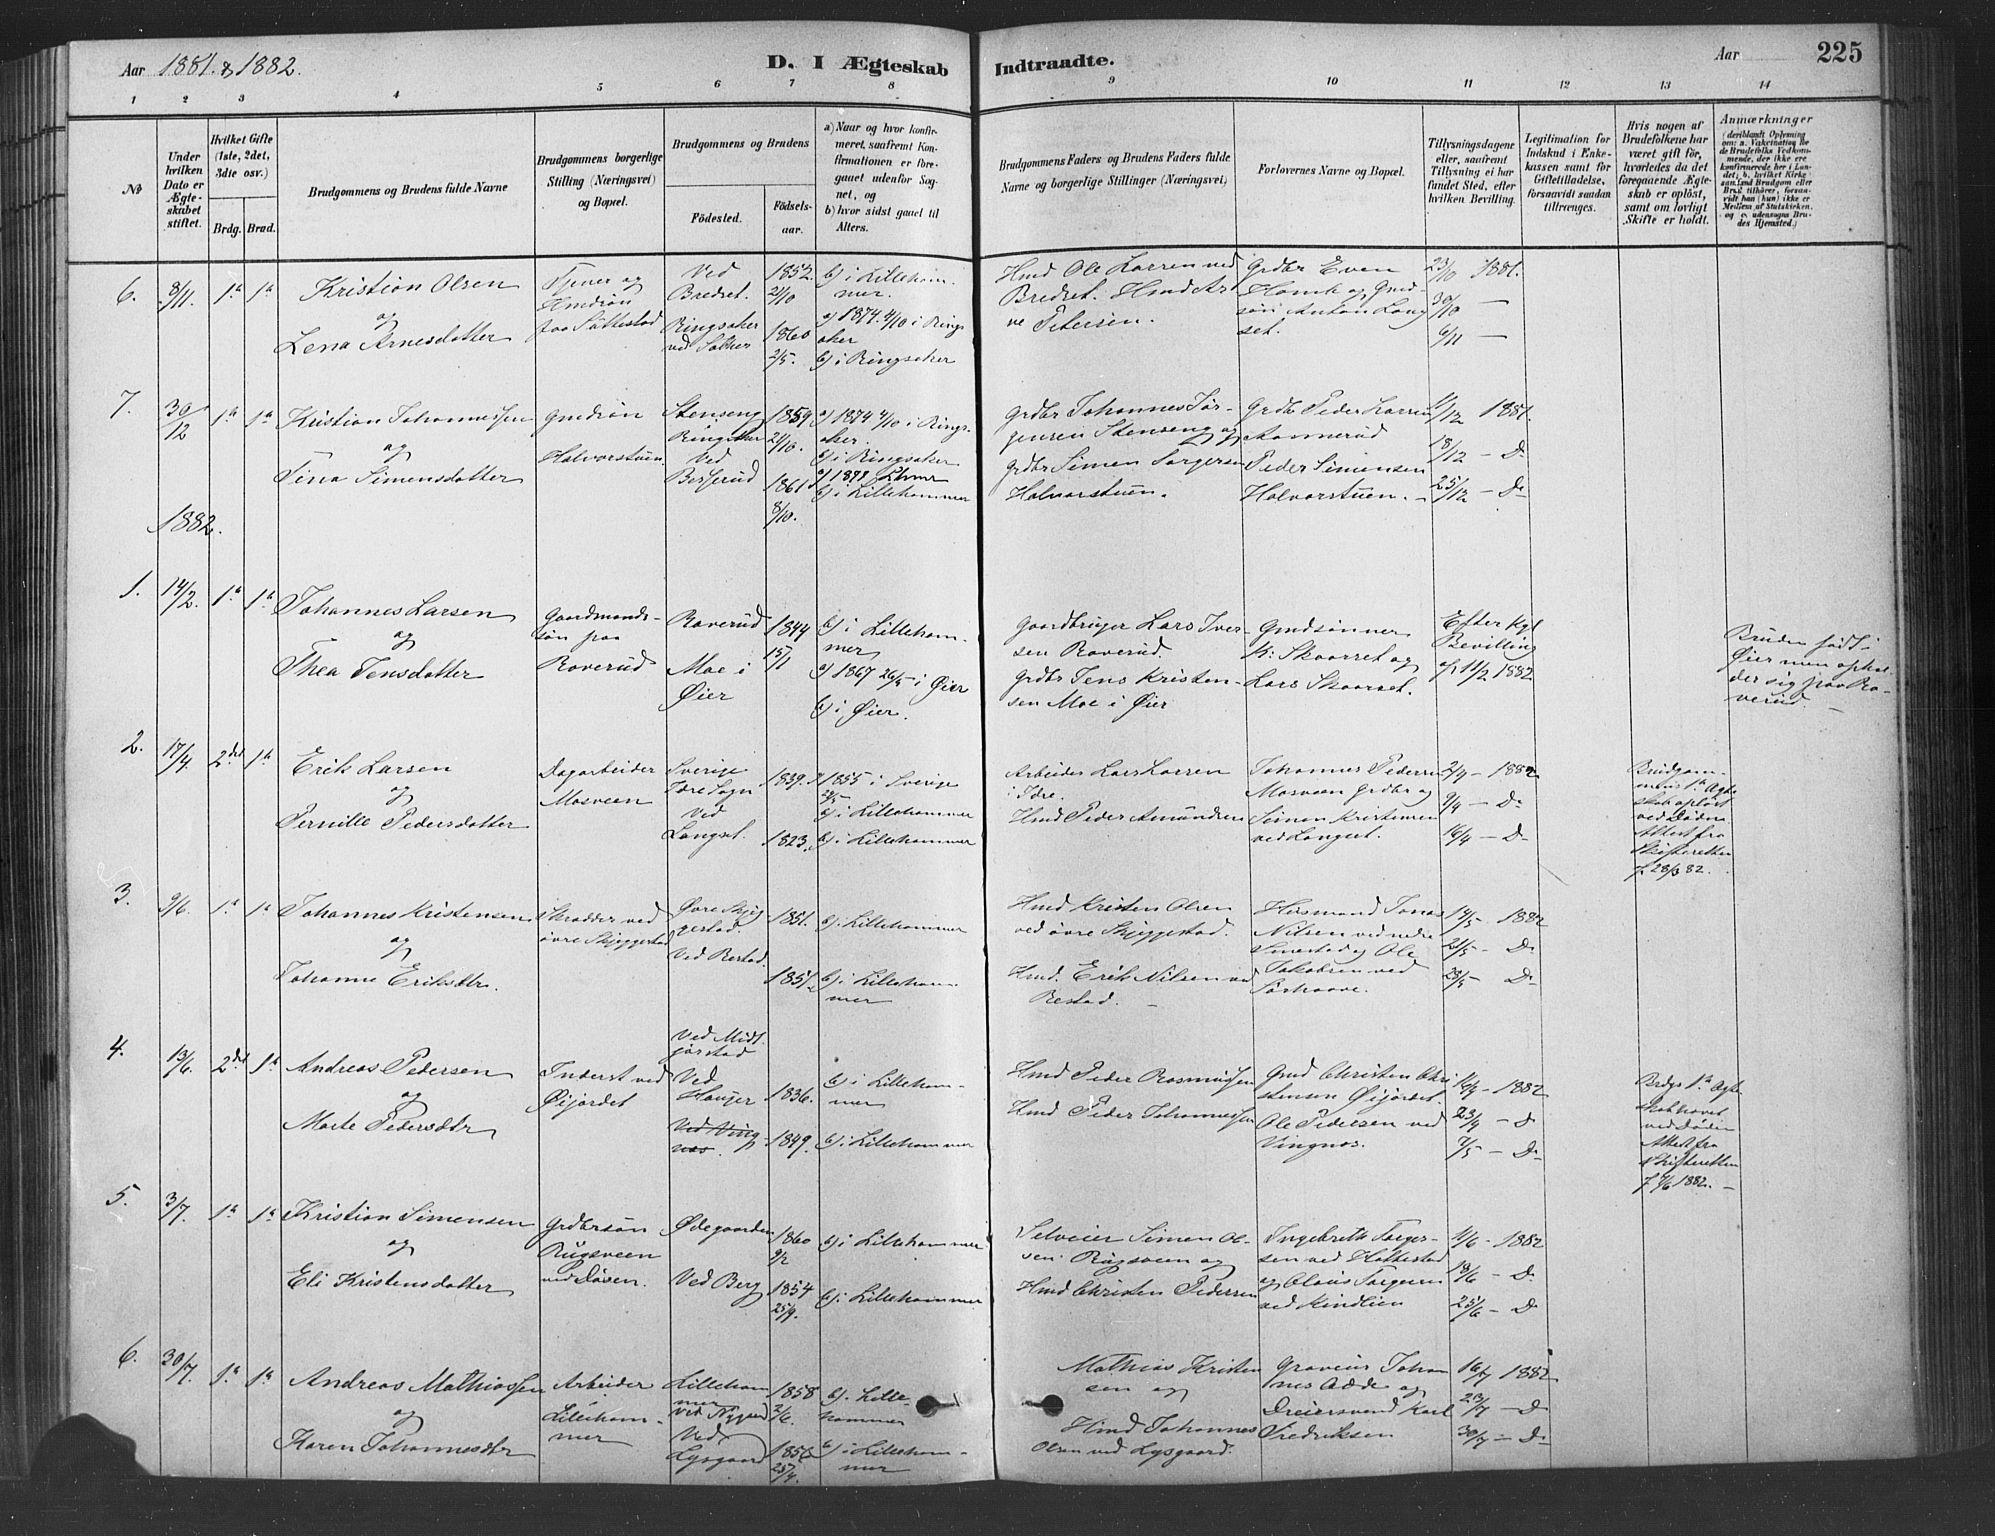 SAH, Fåberg prestekontor, Ministerialbok nr. 9, 1879-1898, s. 225